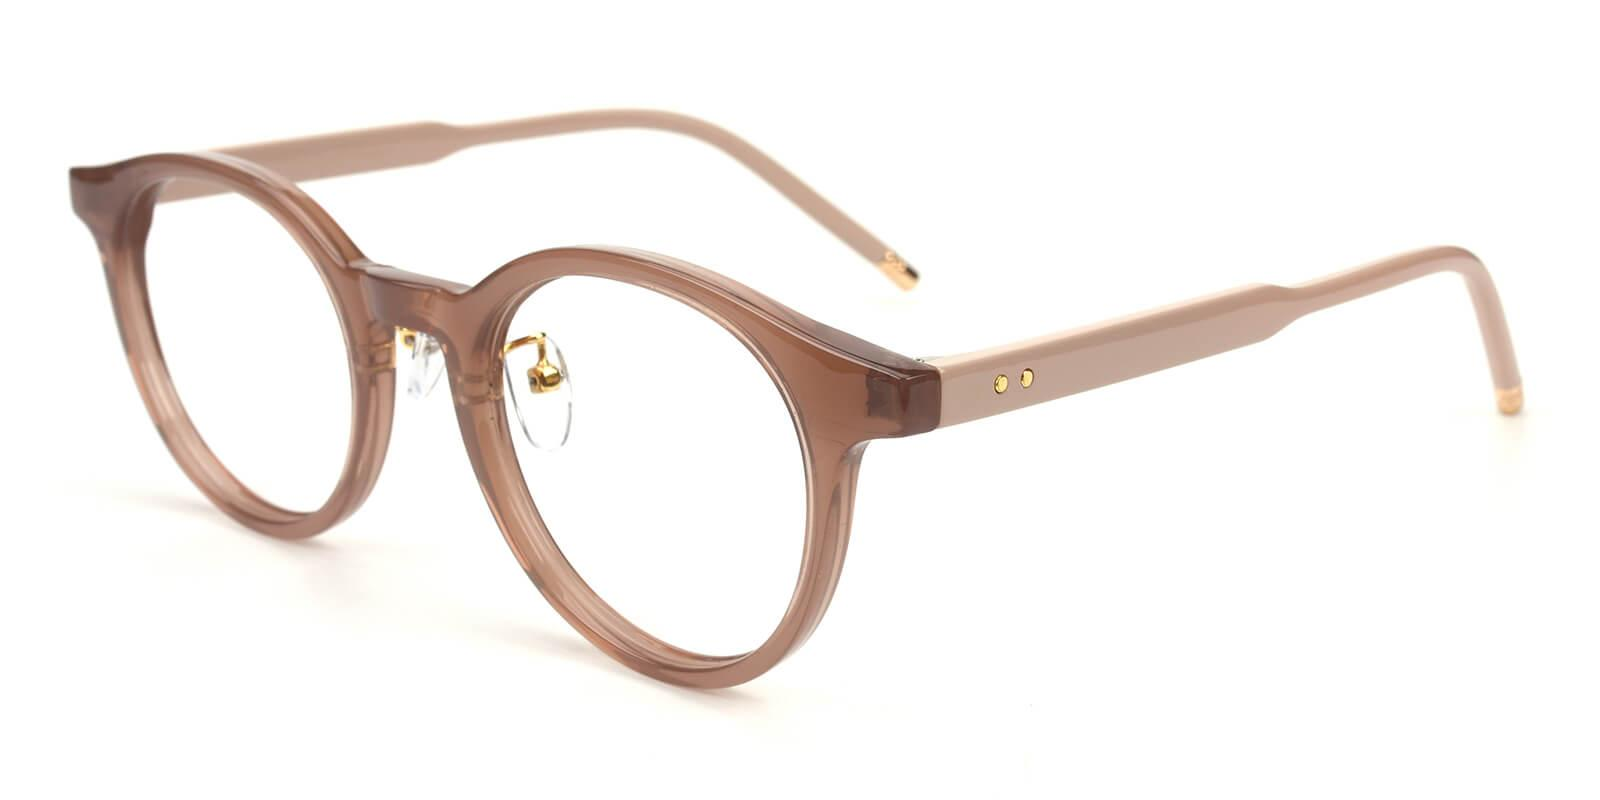 Kron-Multicolor-Round-TR-Eyeglasses-additional1